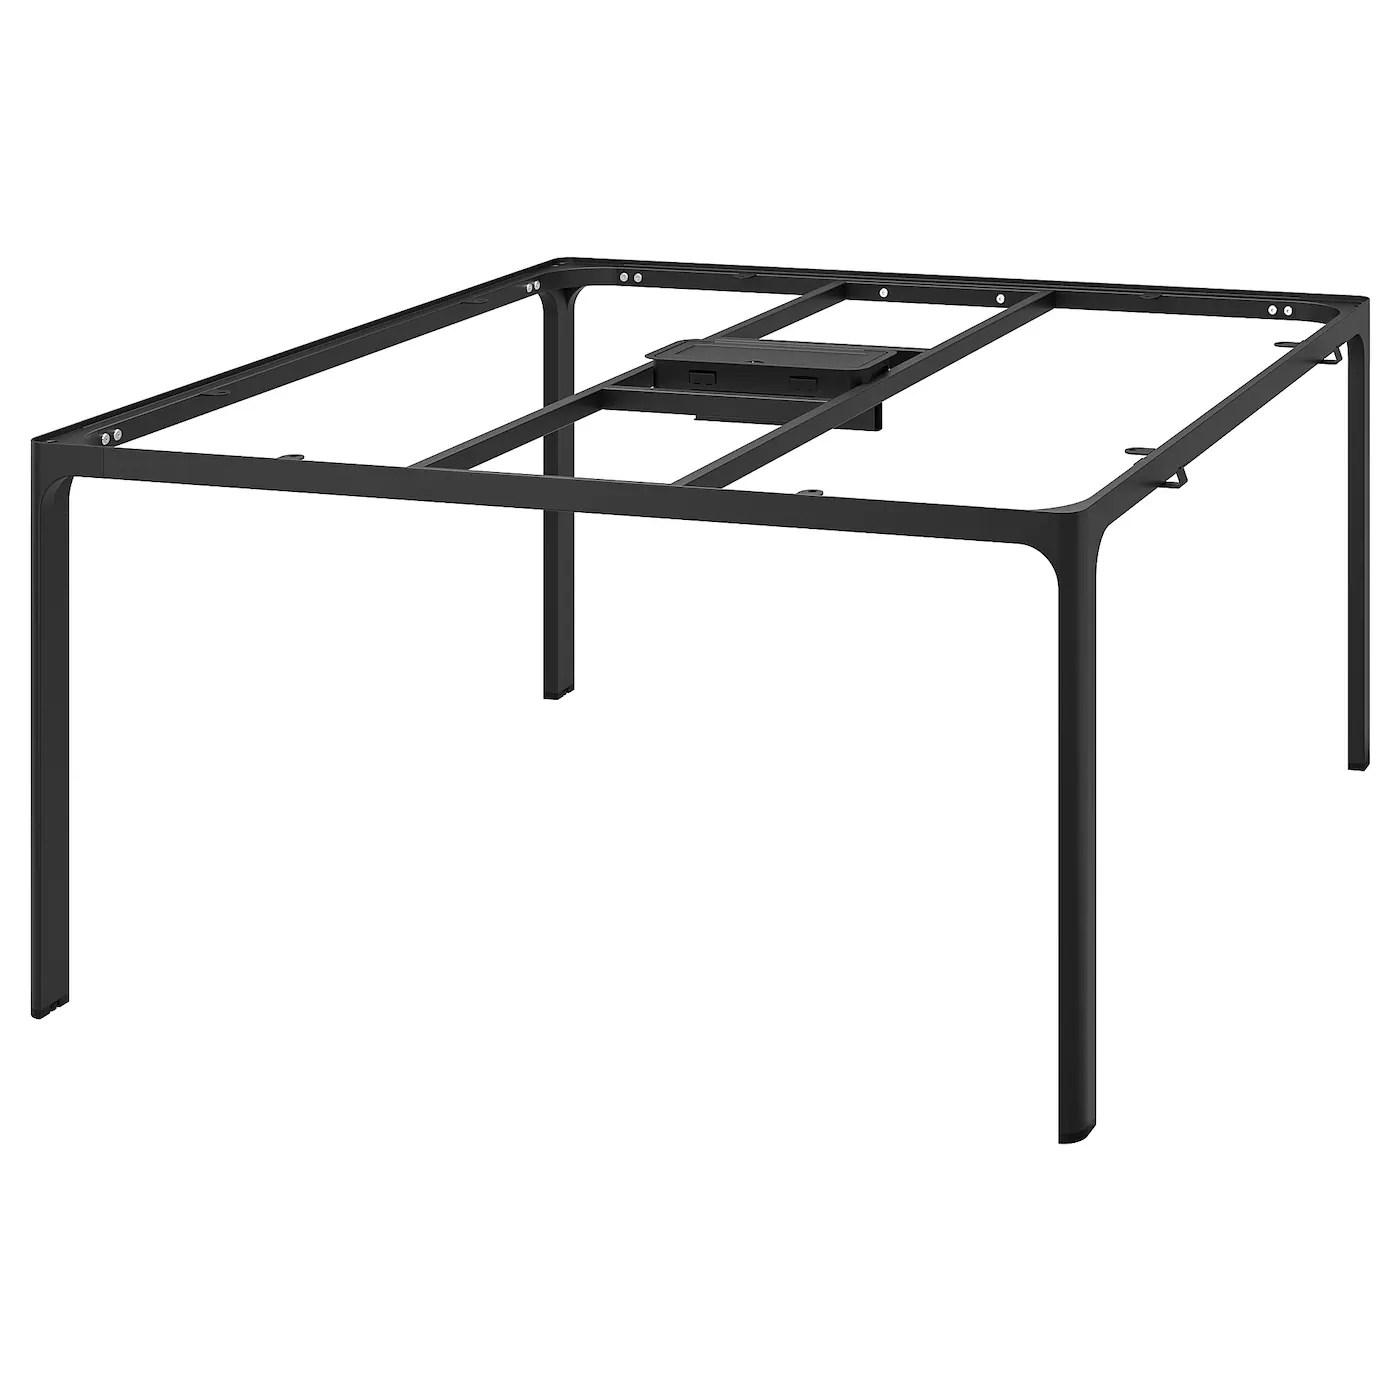 bekant frame for table top black 140x140 cm